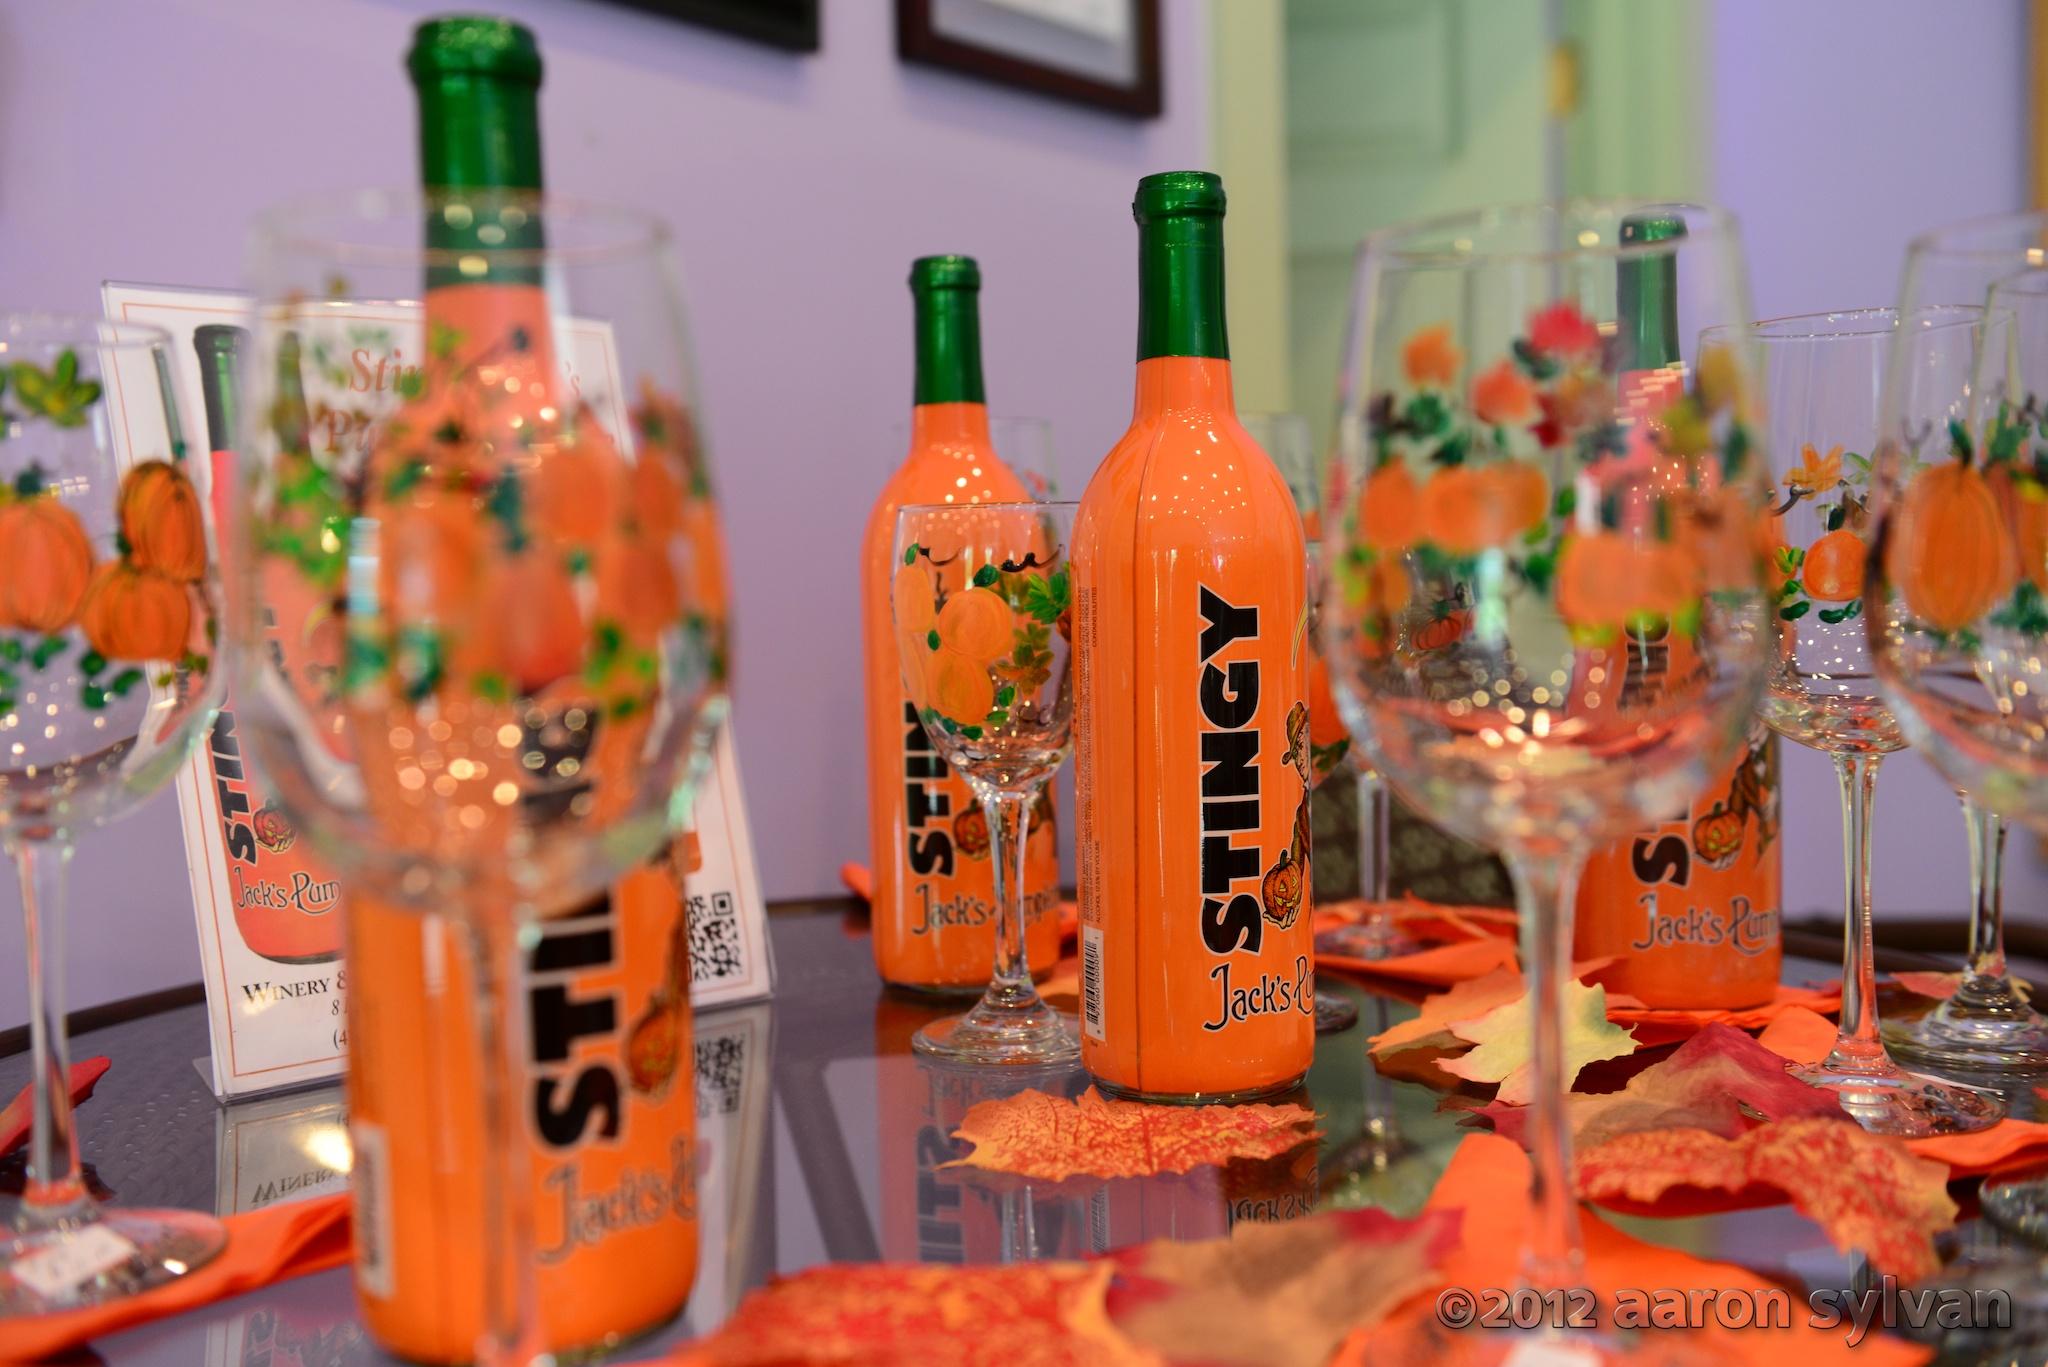 Les-Trois-Emme-Winery-photo-by-Aaron-Sylvan-2012-08-11-404442.jpg